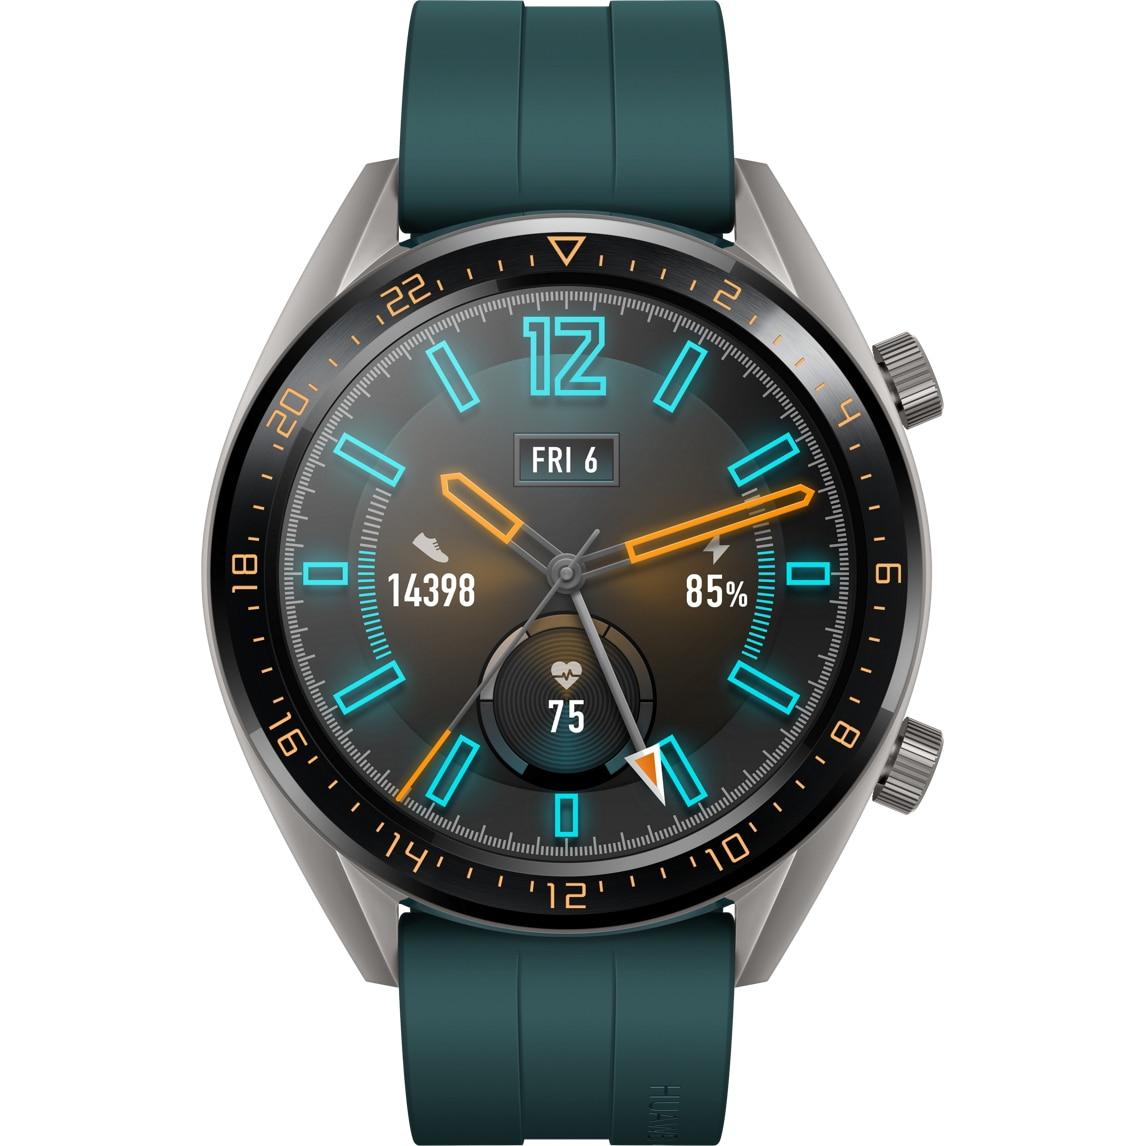 Fotografie Ceas smartwatch Huawei Watch GT, Dark Green